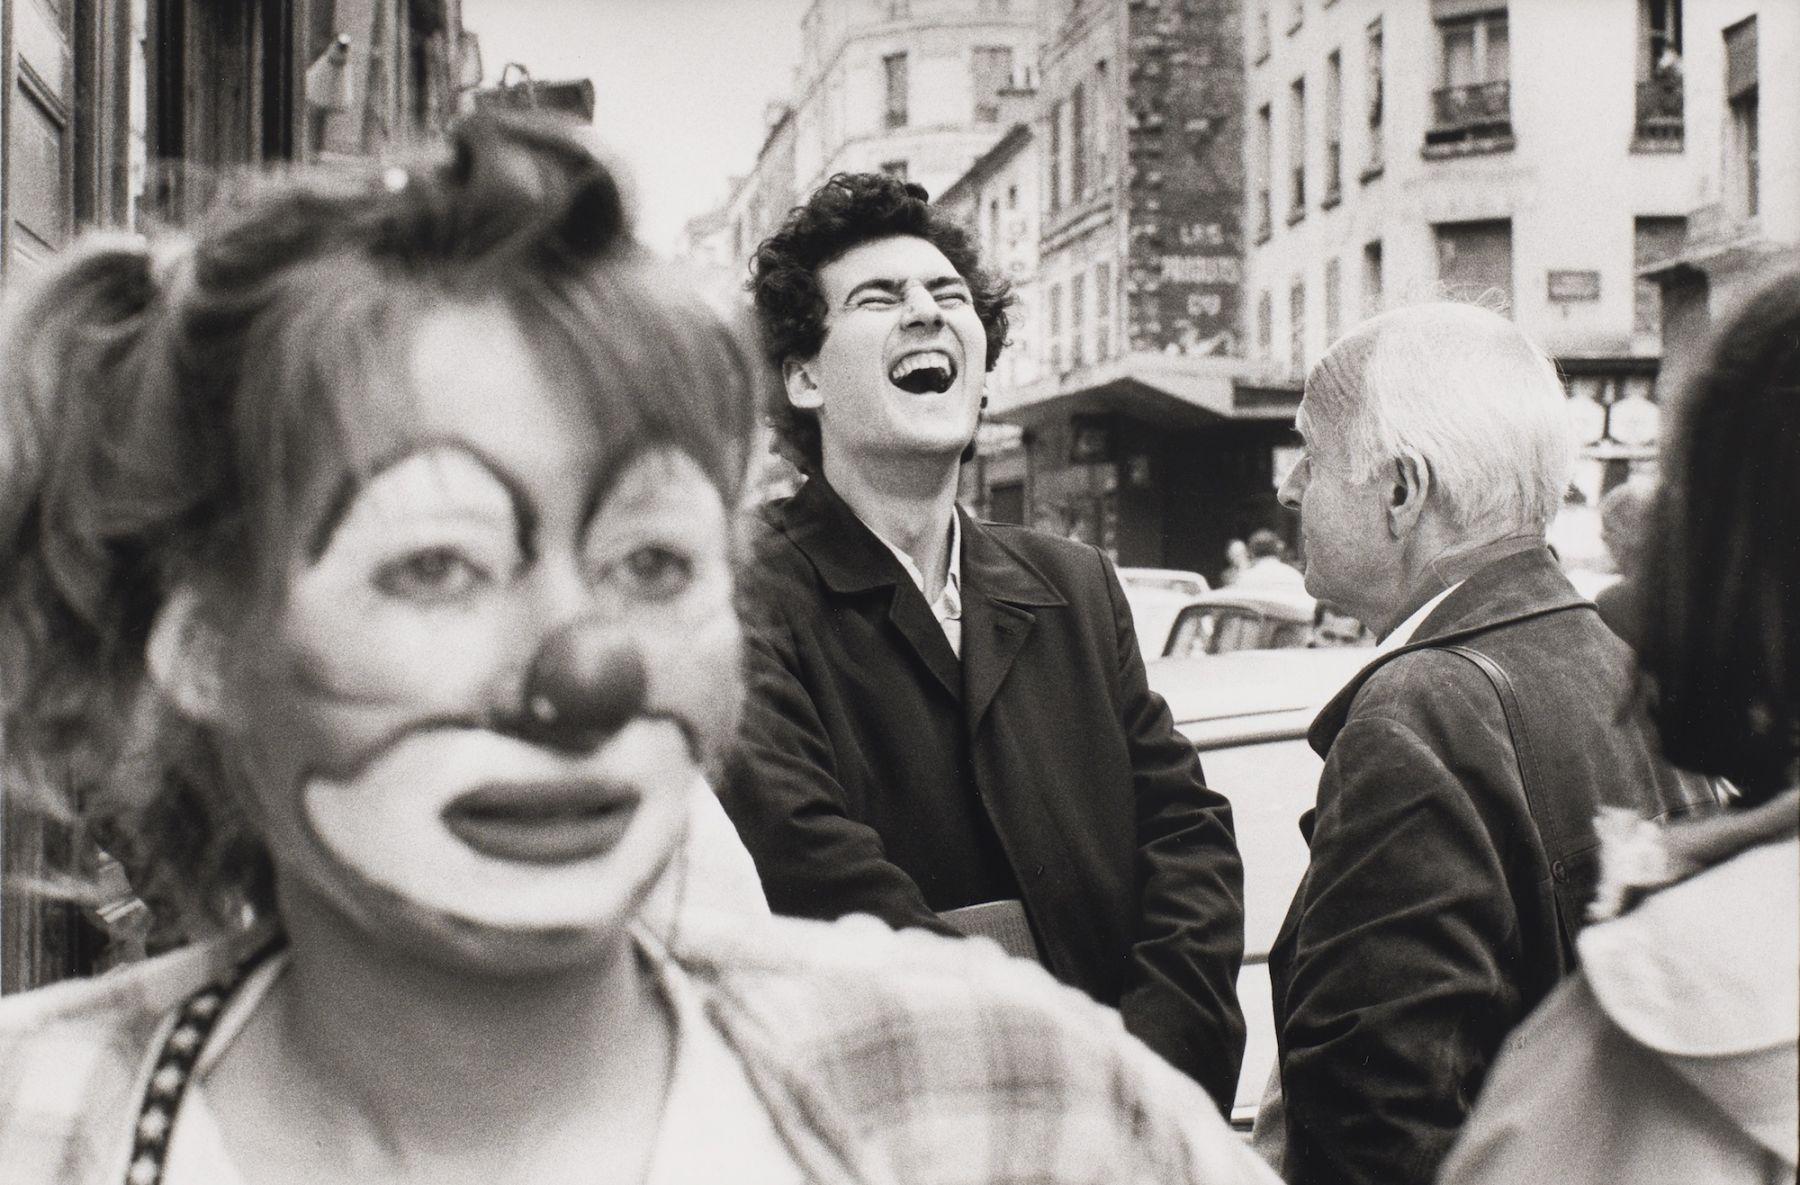 Philippe Salaun (1943-)  Jean Francois Chevrier et Henri Cartier Bresson, Paris, 1979  Gelatin silver print  12 x 16 inches (paper), black and white photography